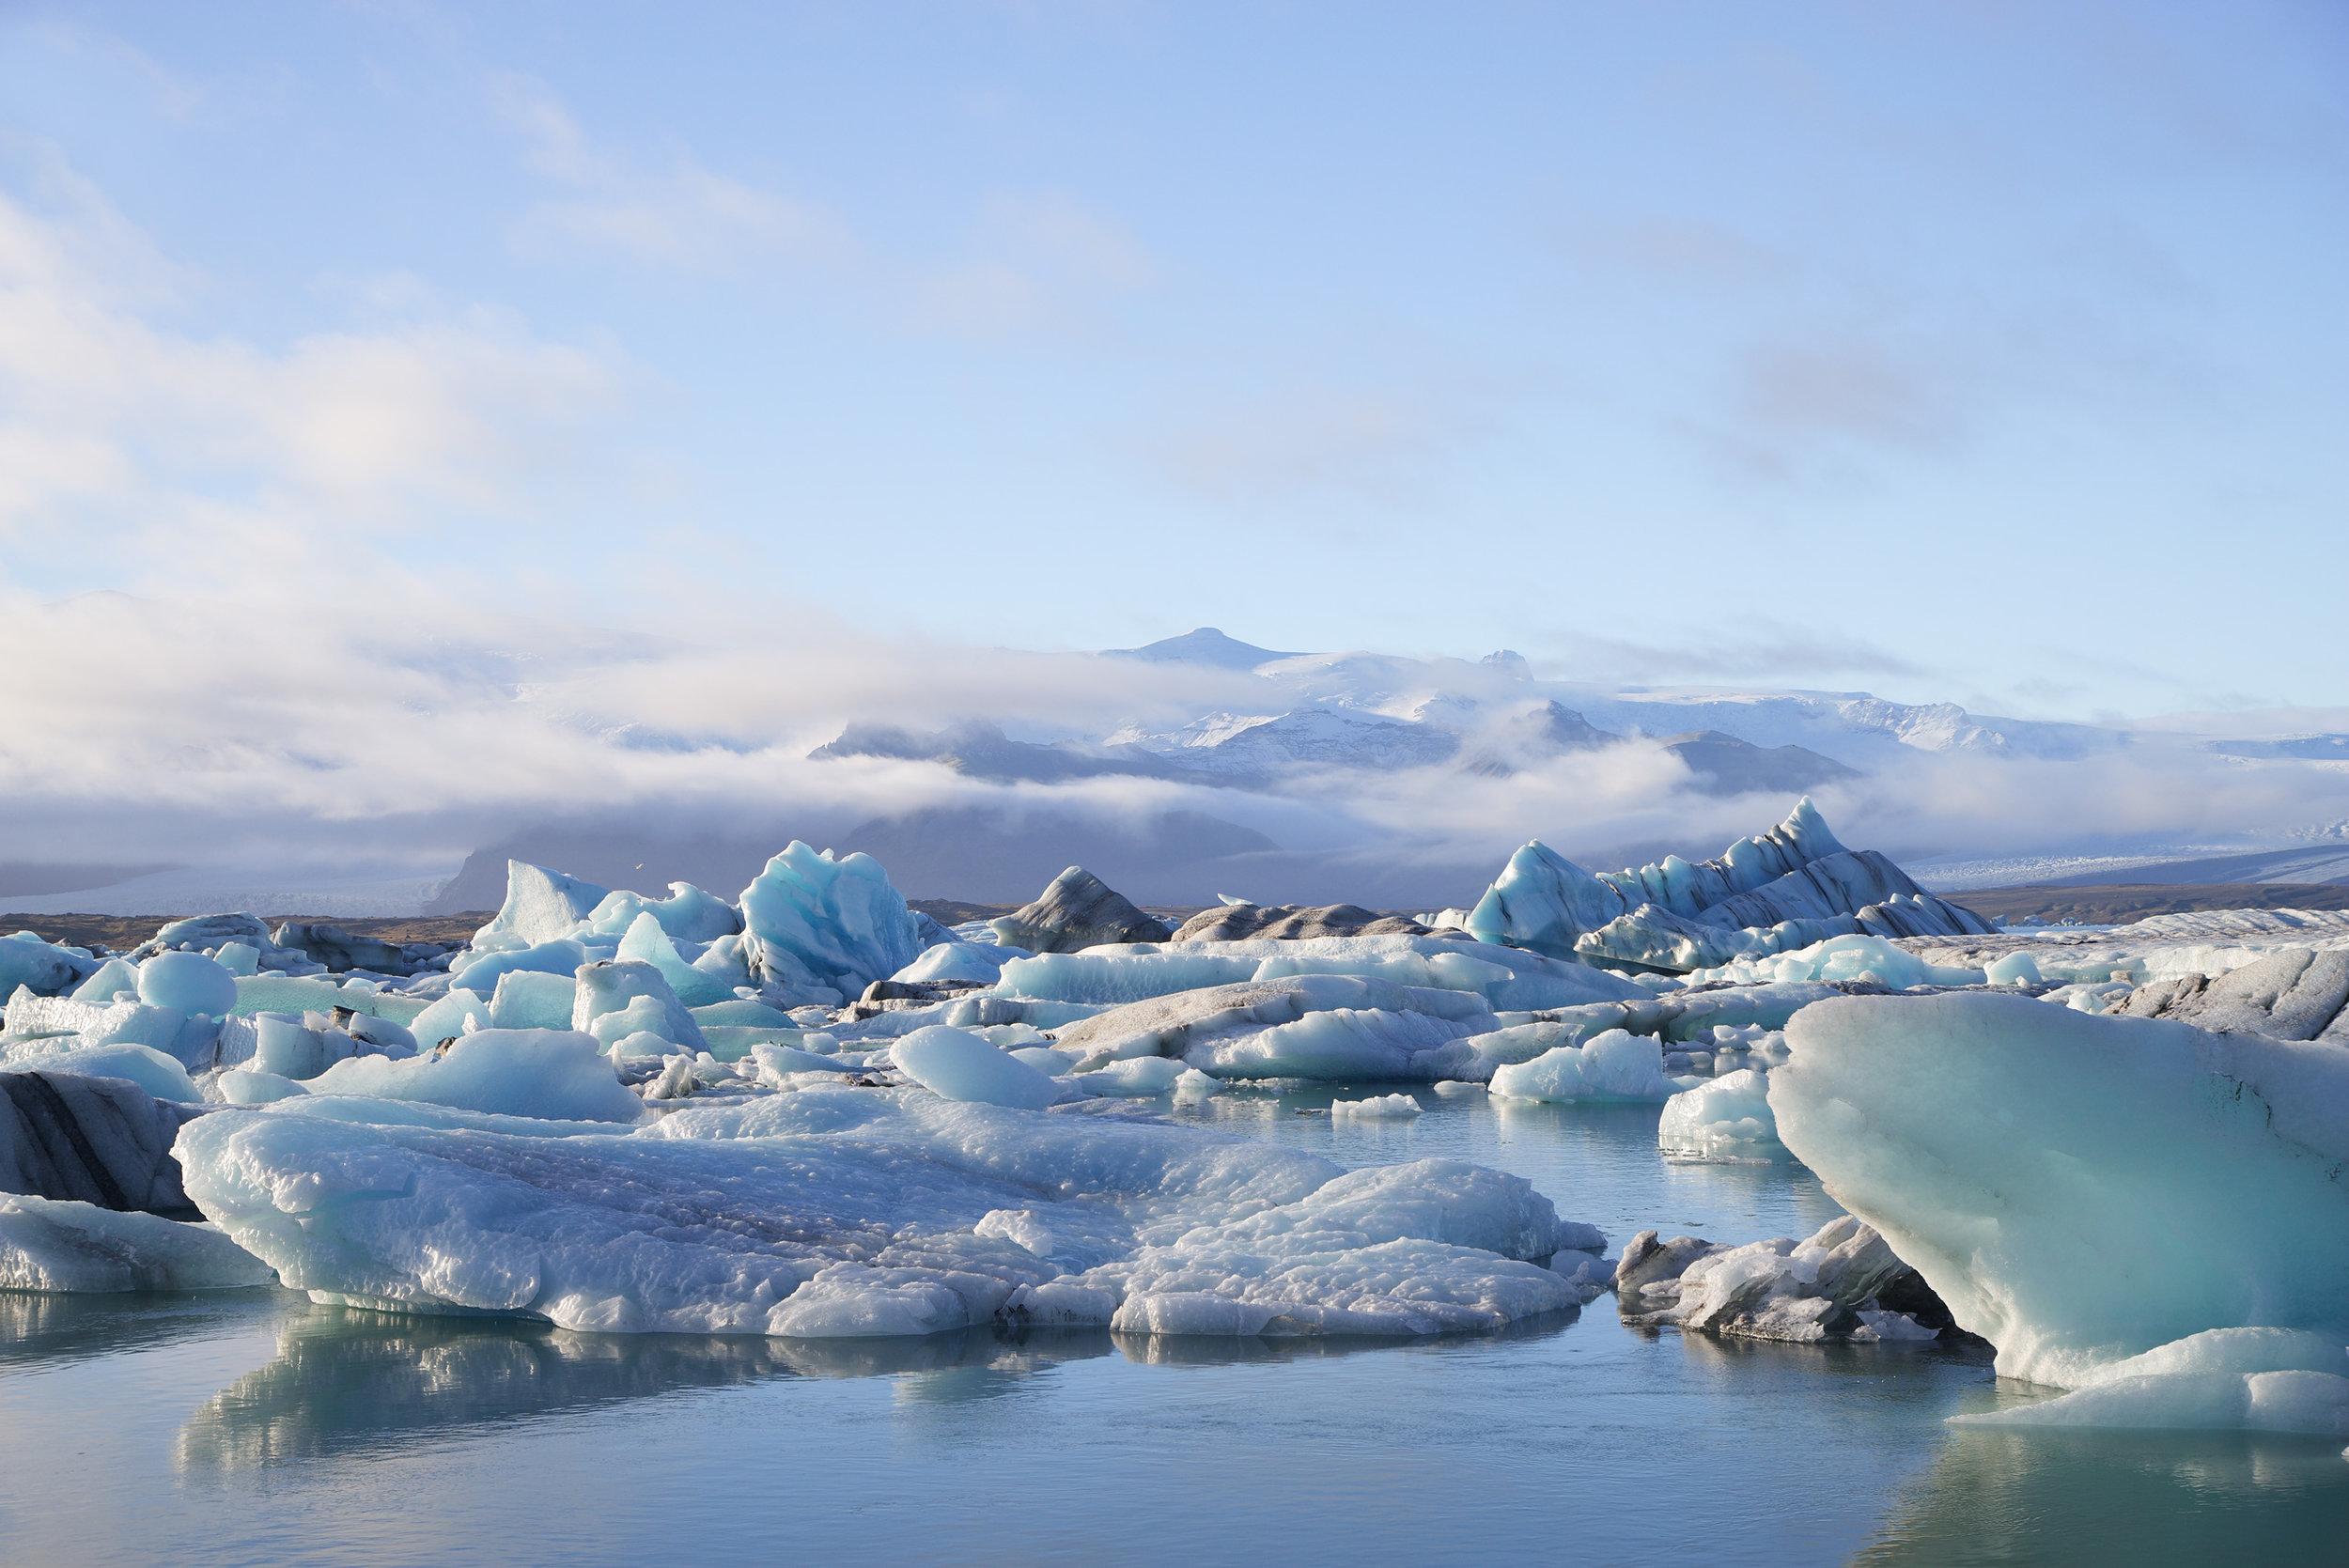 Iceland_Glaciers_Mountains.jpg